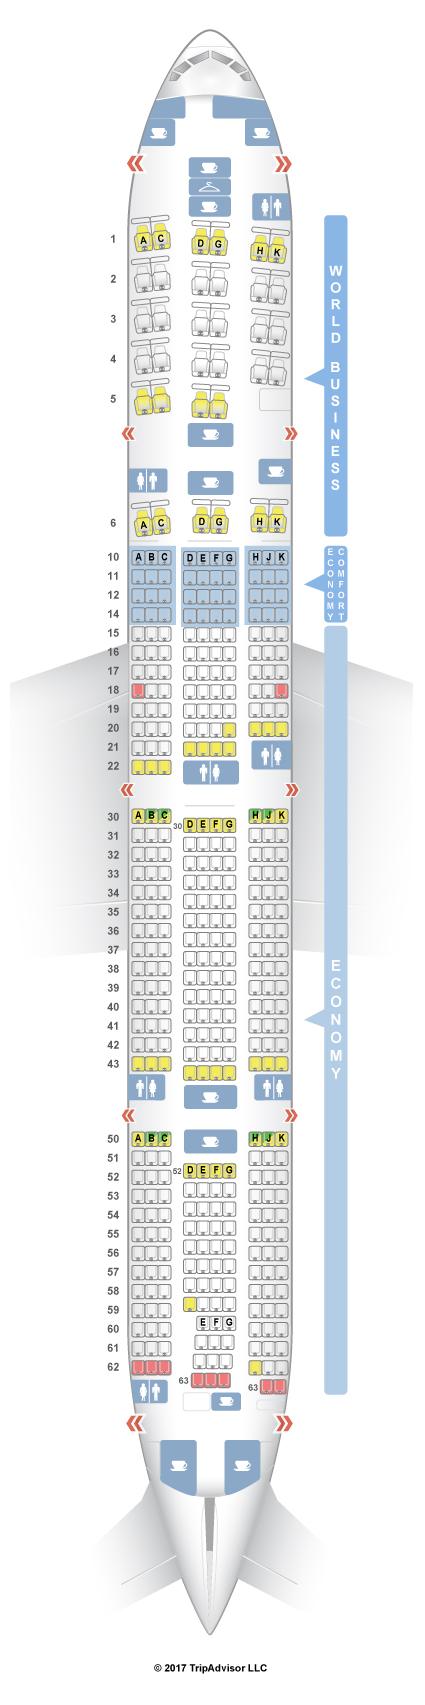 SeatGuru Seat Map KLM Boeing 777-300ER (77W)